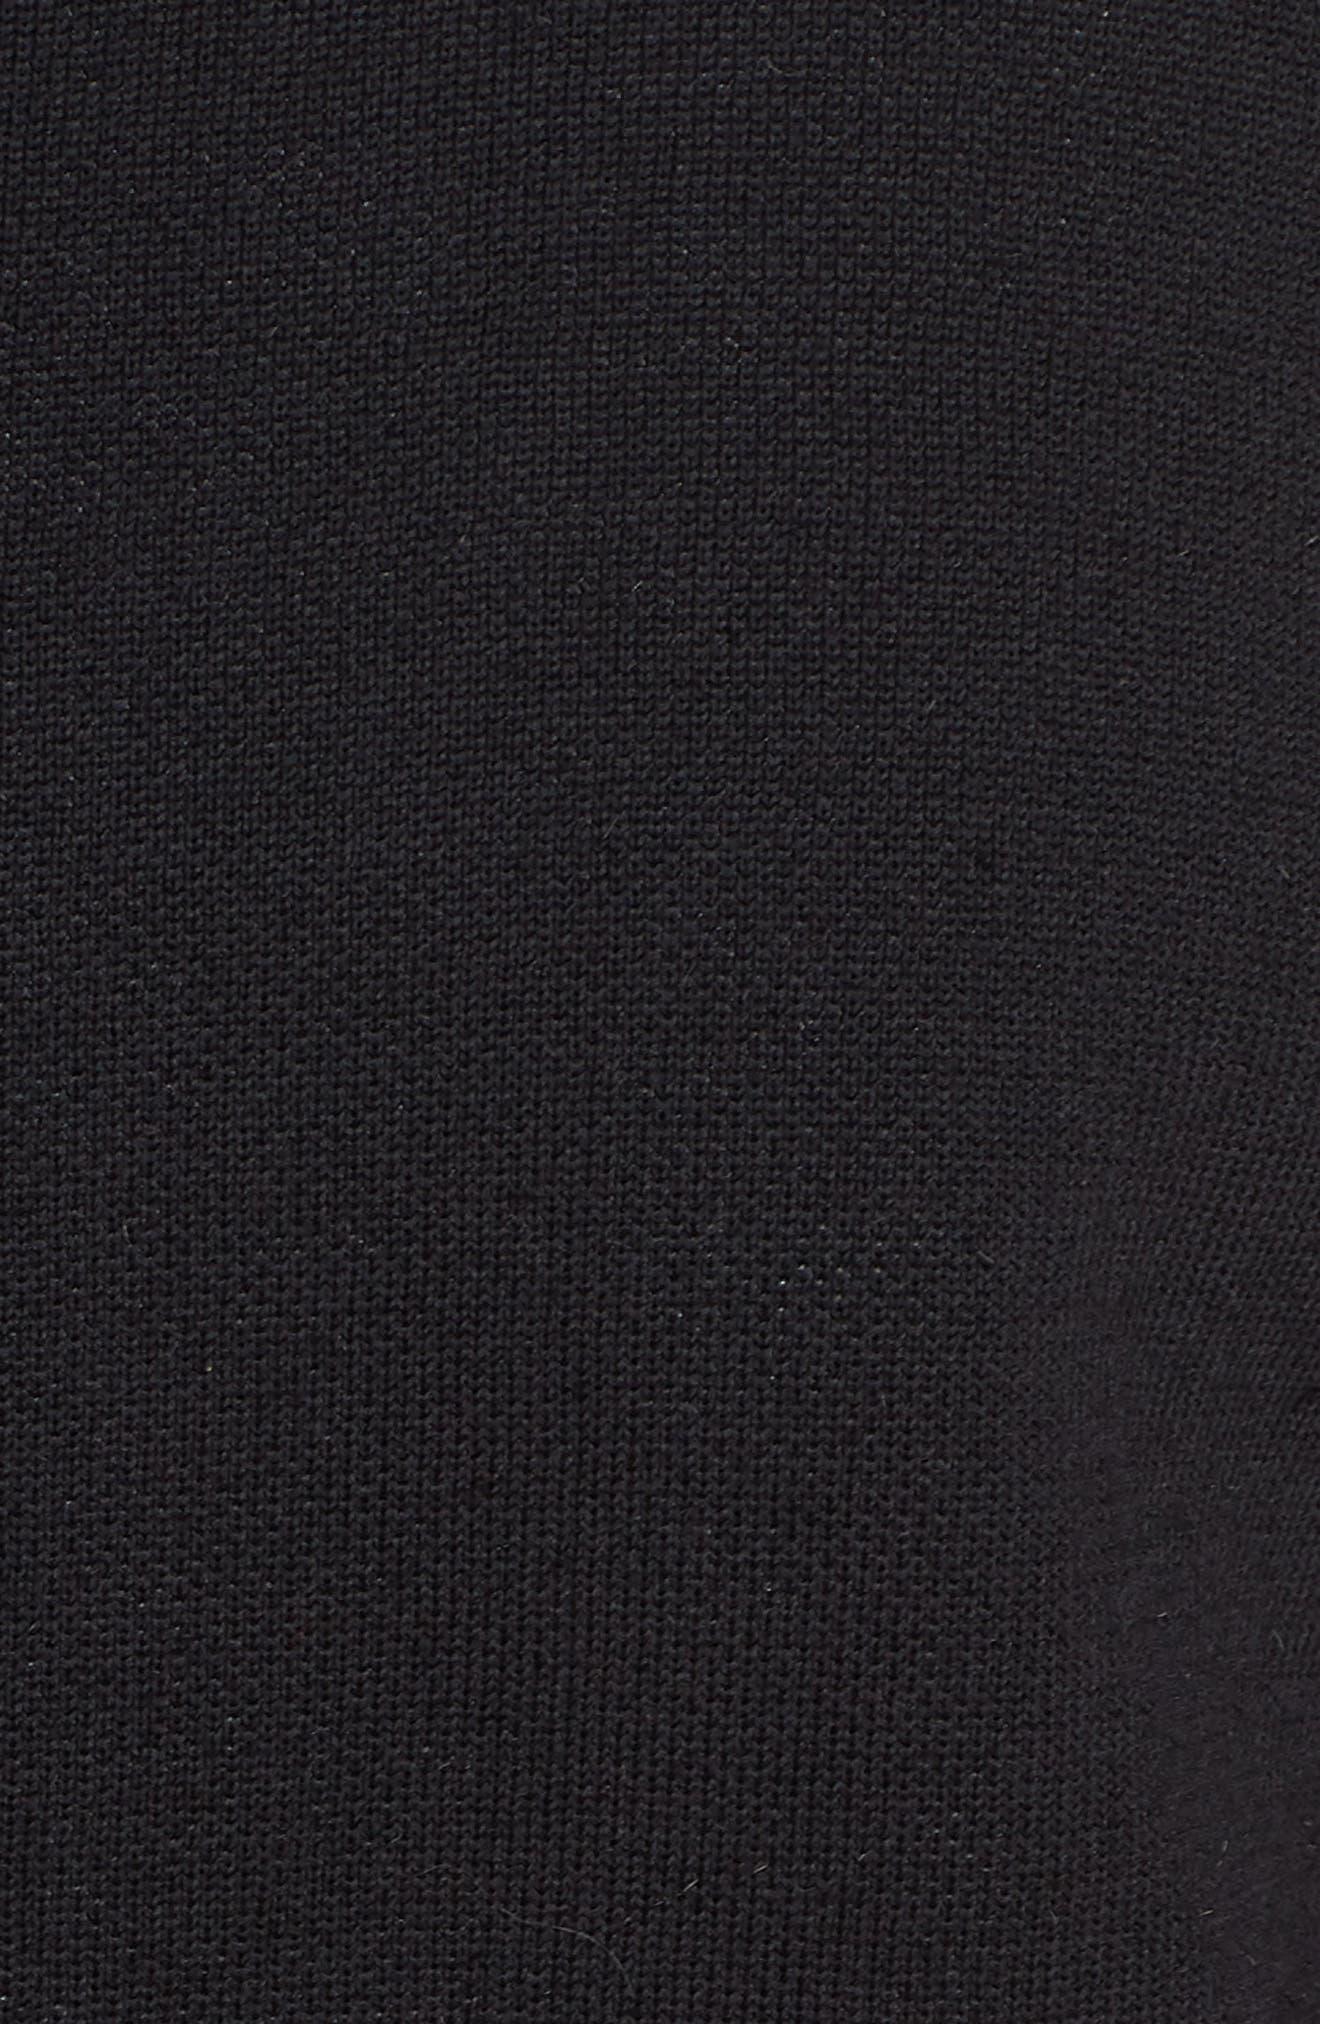 NRG Women's Knit Jacket,                             Alternate thumbnail 5, color,                             Black/ Vast Grey